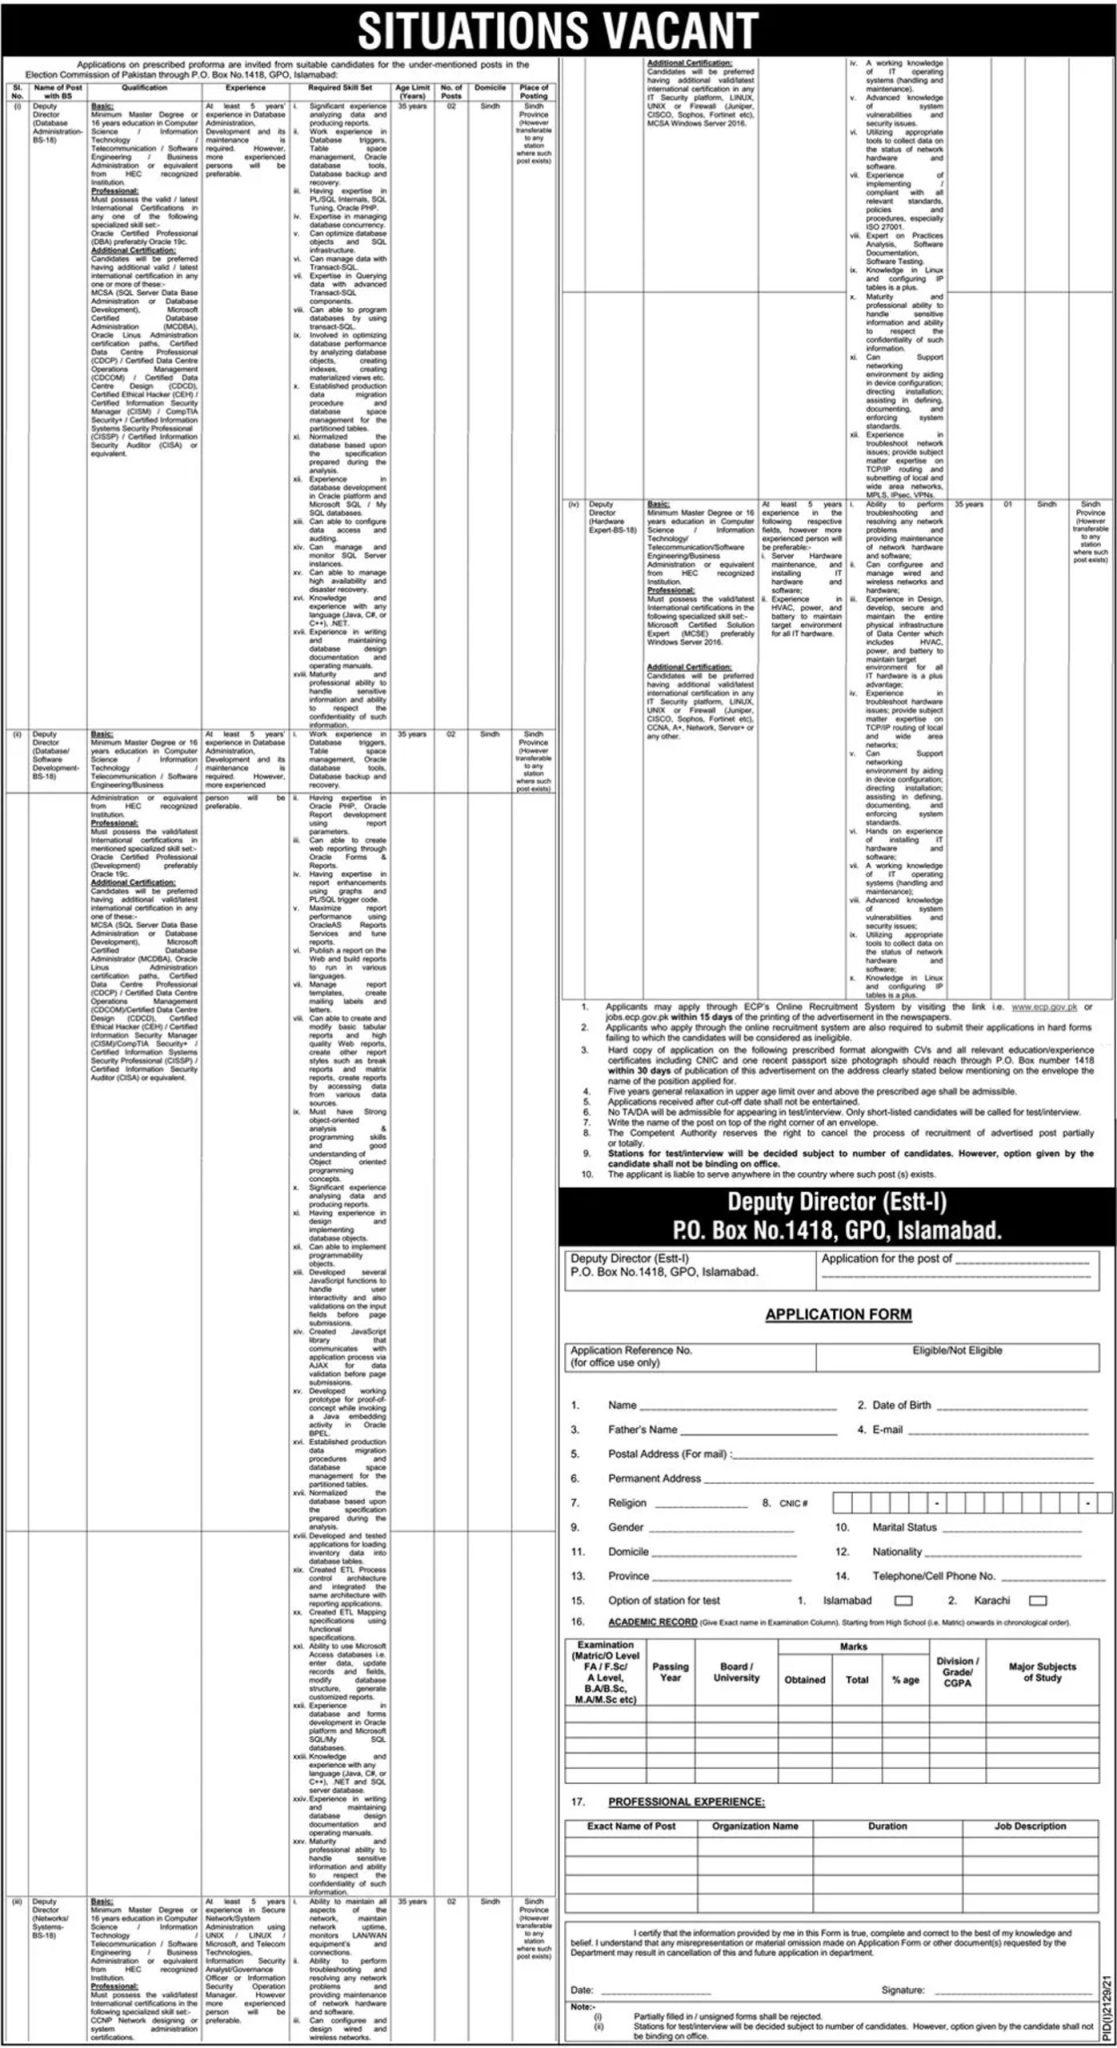 Election Commission of Pakistan ECP Jobs 2021 – www.ecp.gov.pk